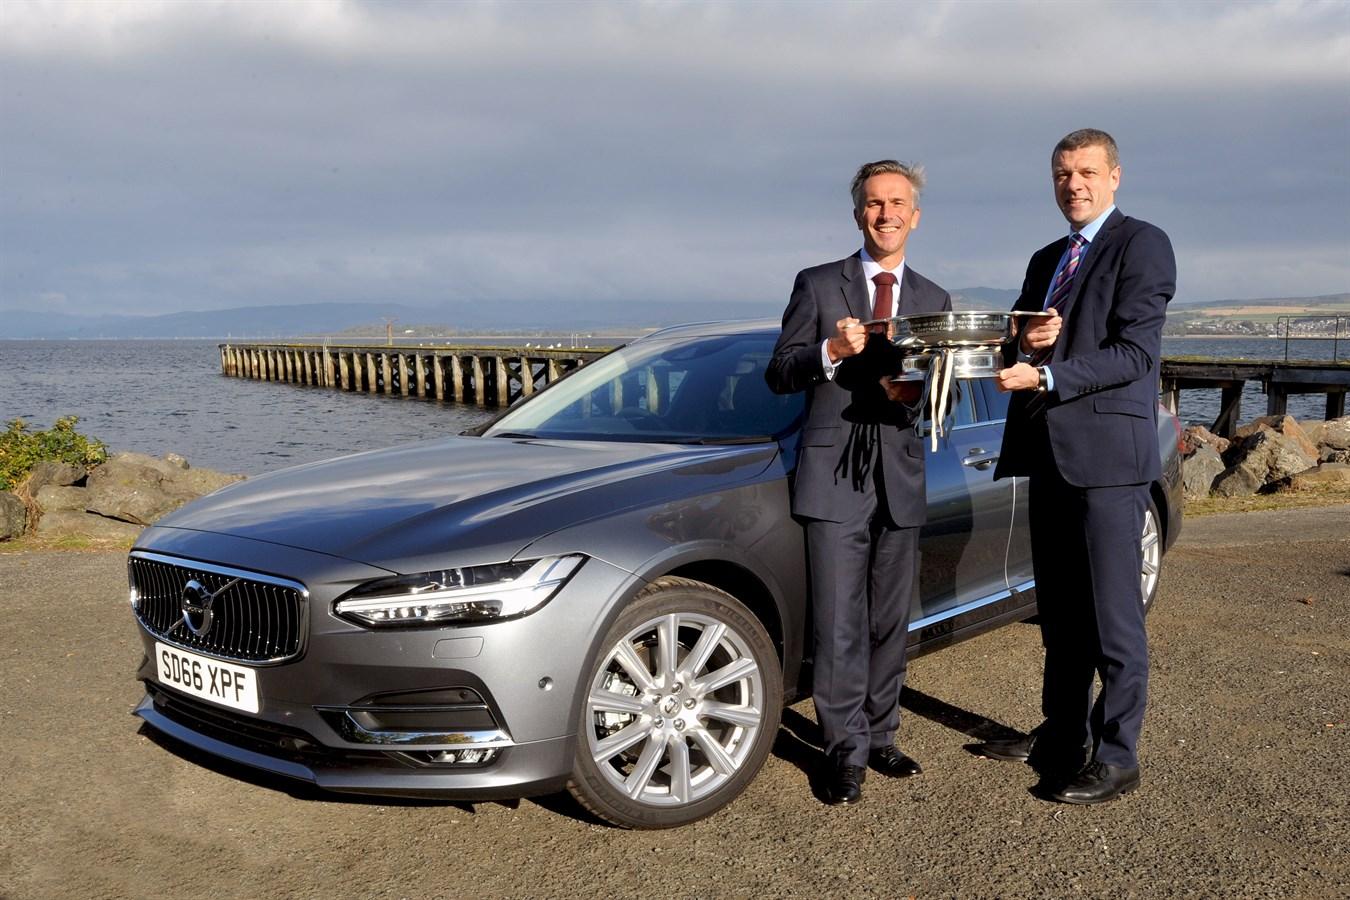 Jon Wakefield Stephen Park And The Award Winning Volvo V90 Volvo Car Uk Media Newsroom